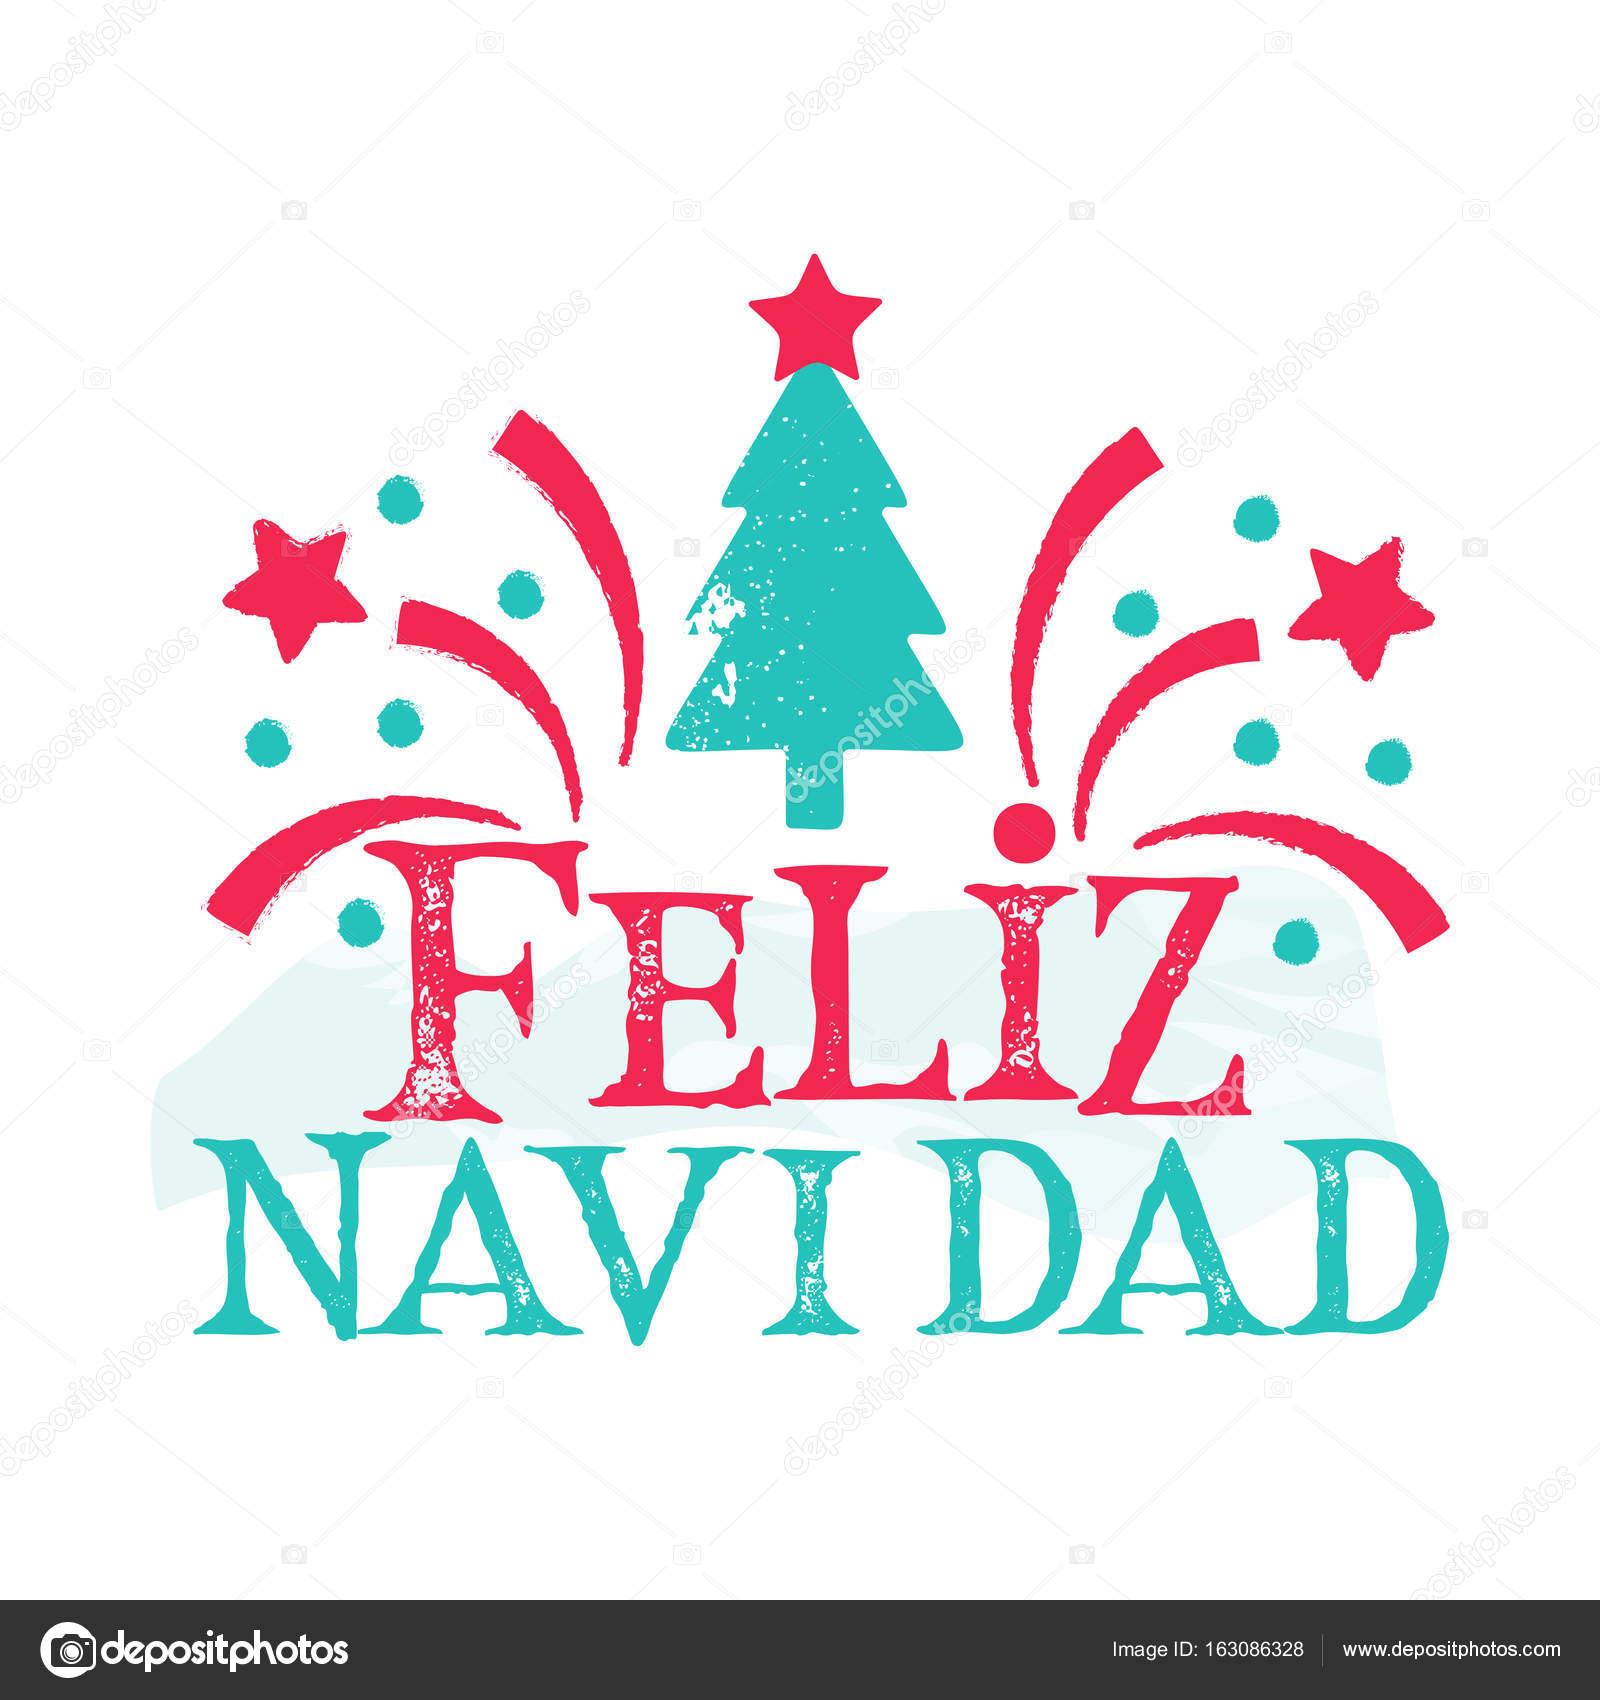 Merry Christmas In Spanish.Feliz Navidad Merry Christmas Spanish Language Stock